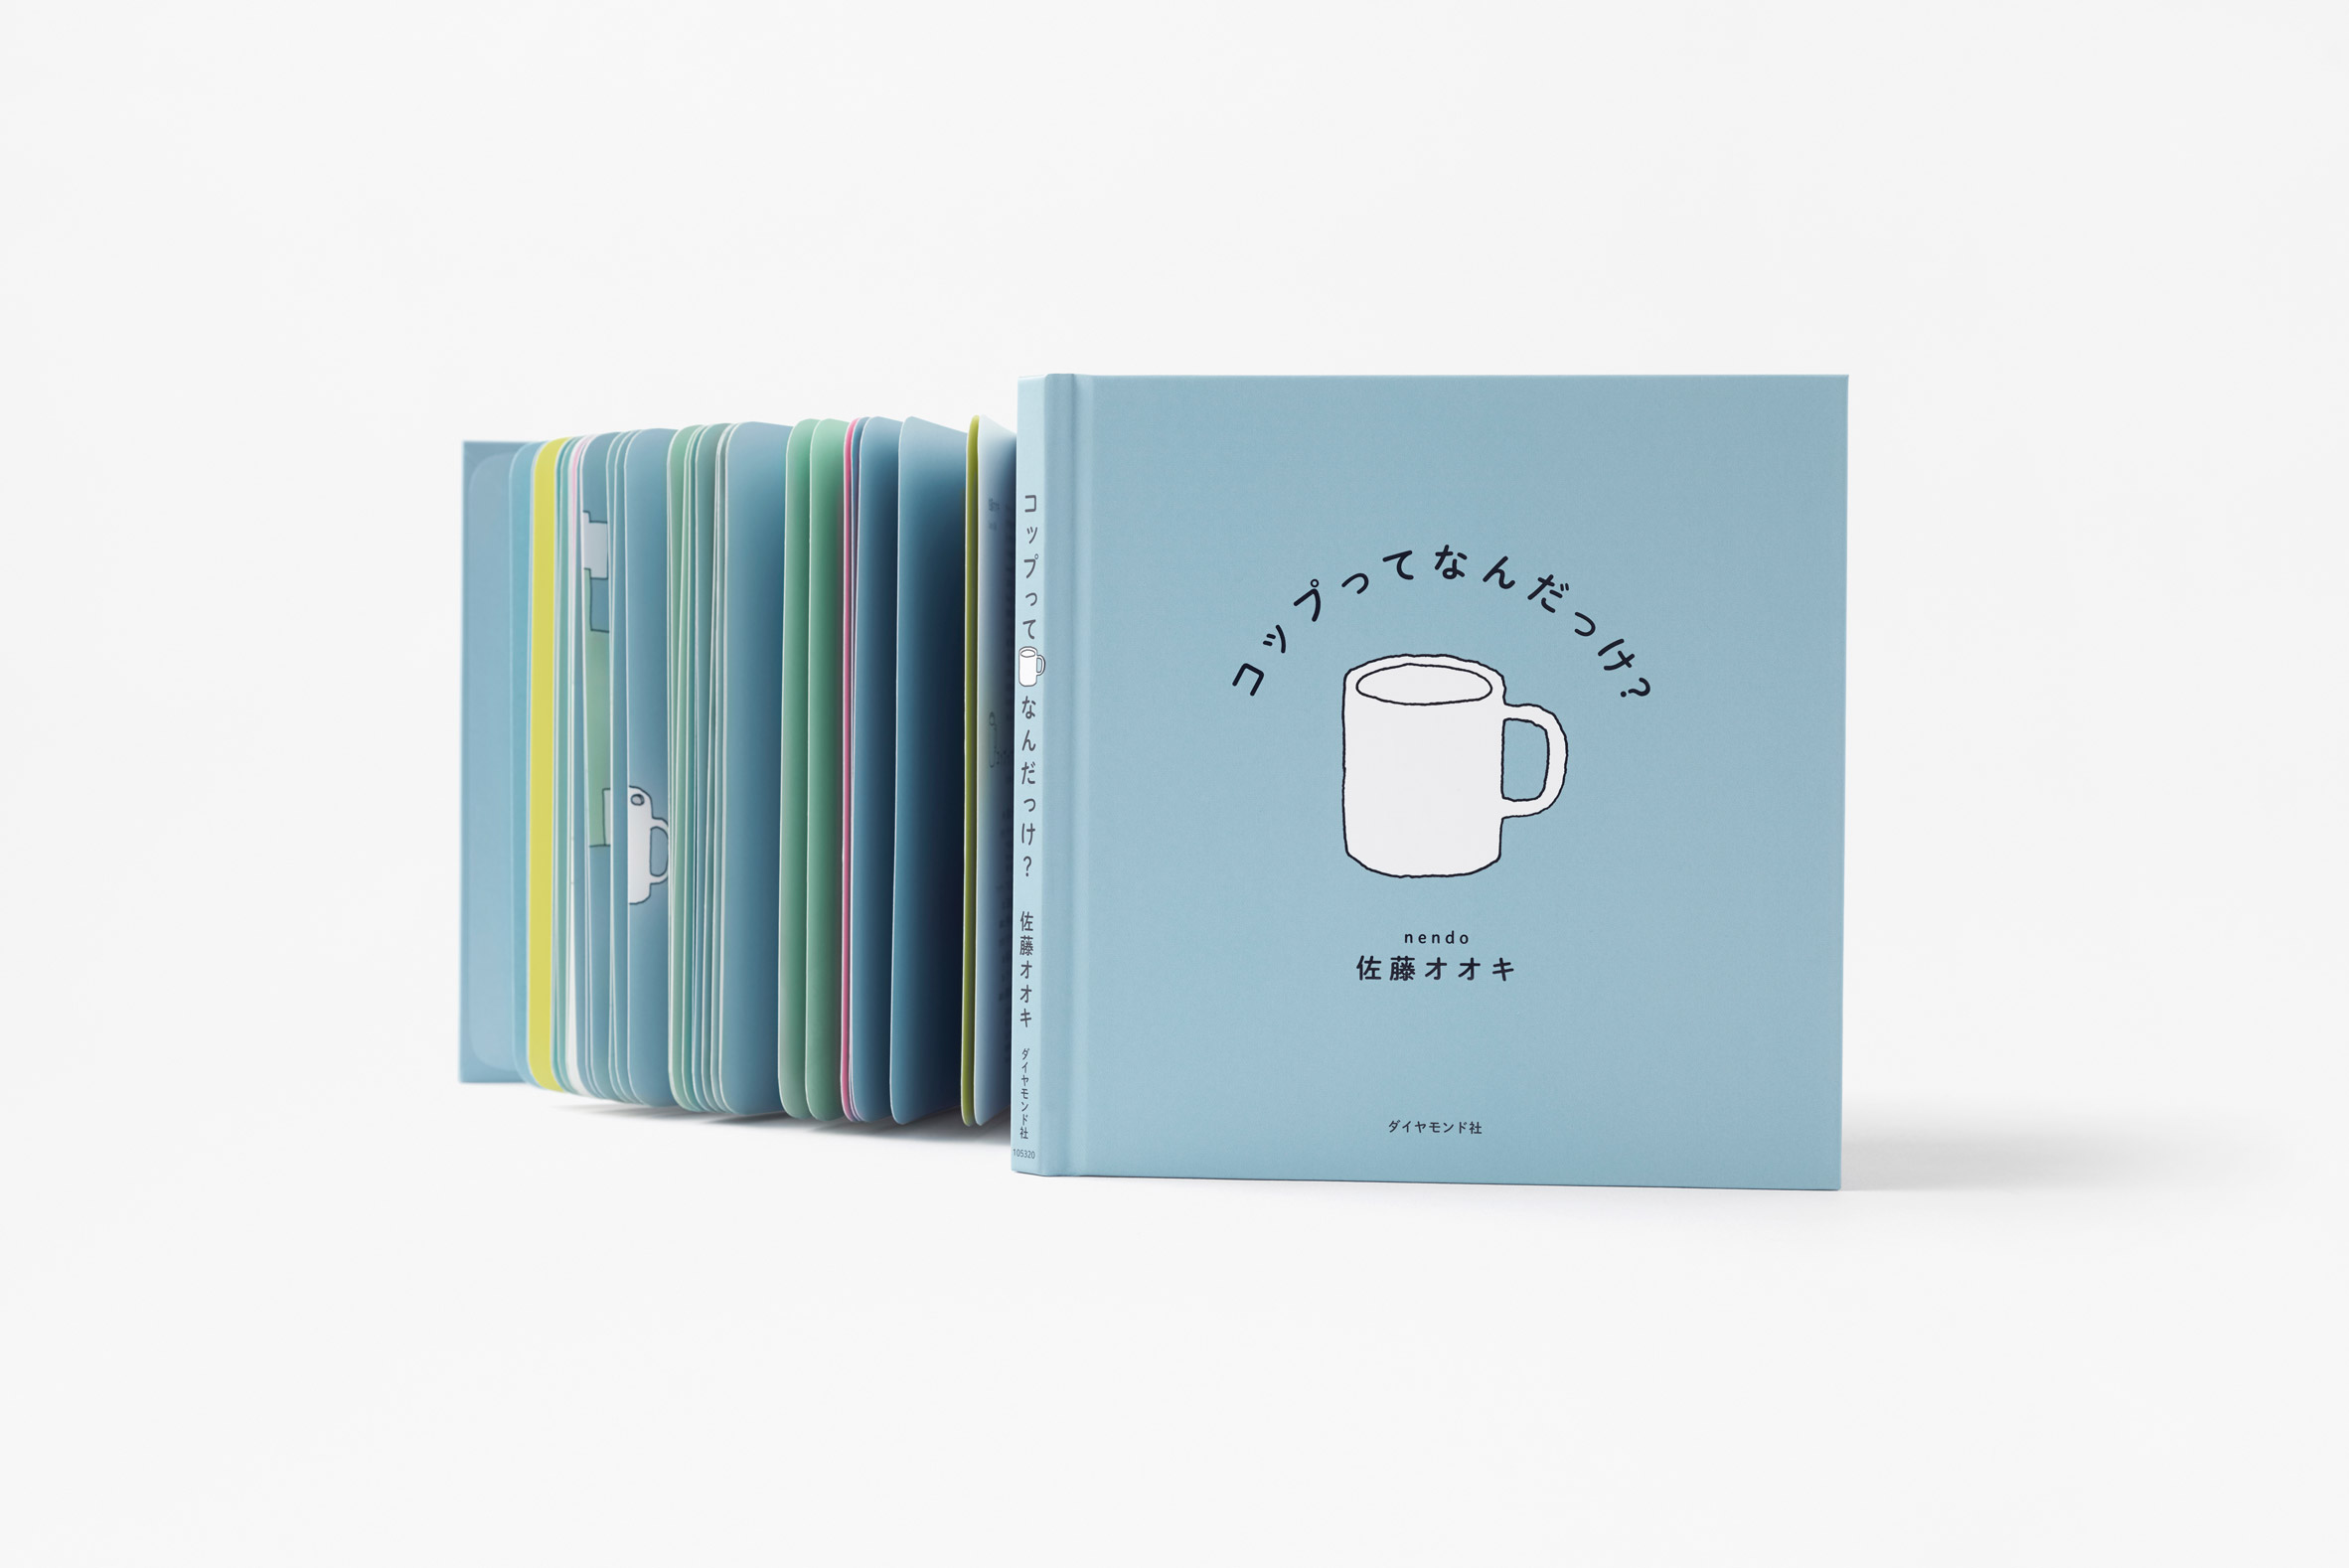 nendo-not-just-a-cup-akihiro-yoshida-5